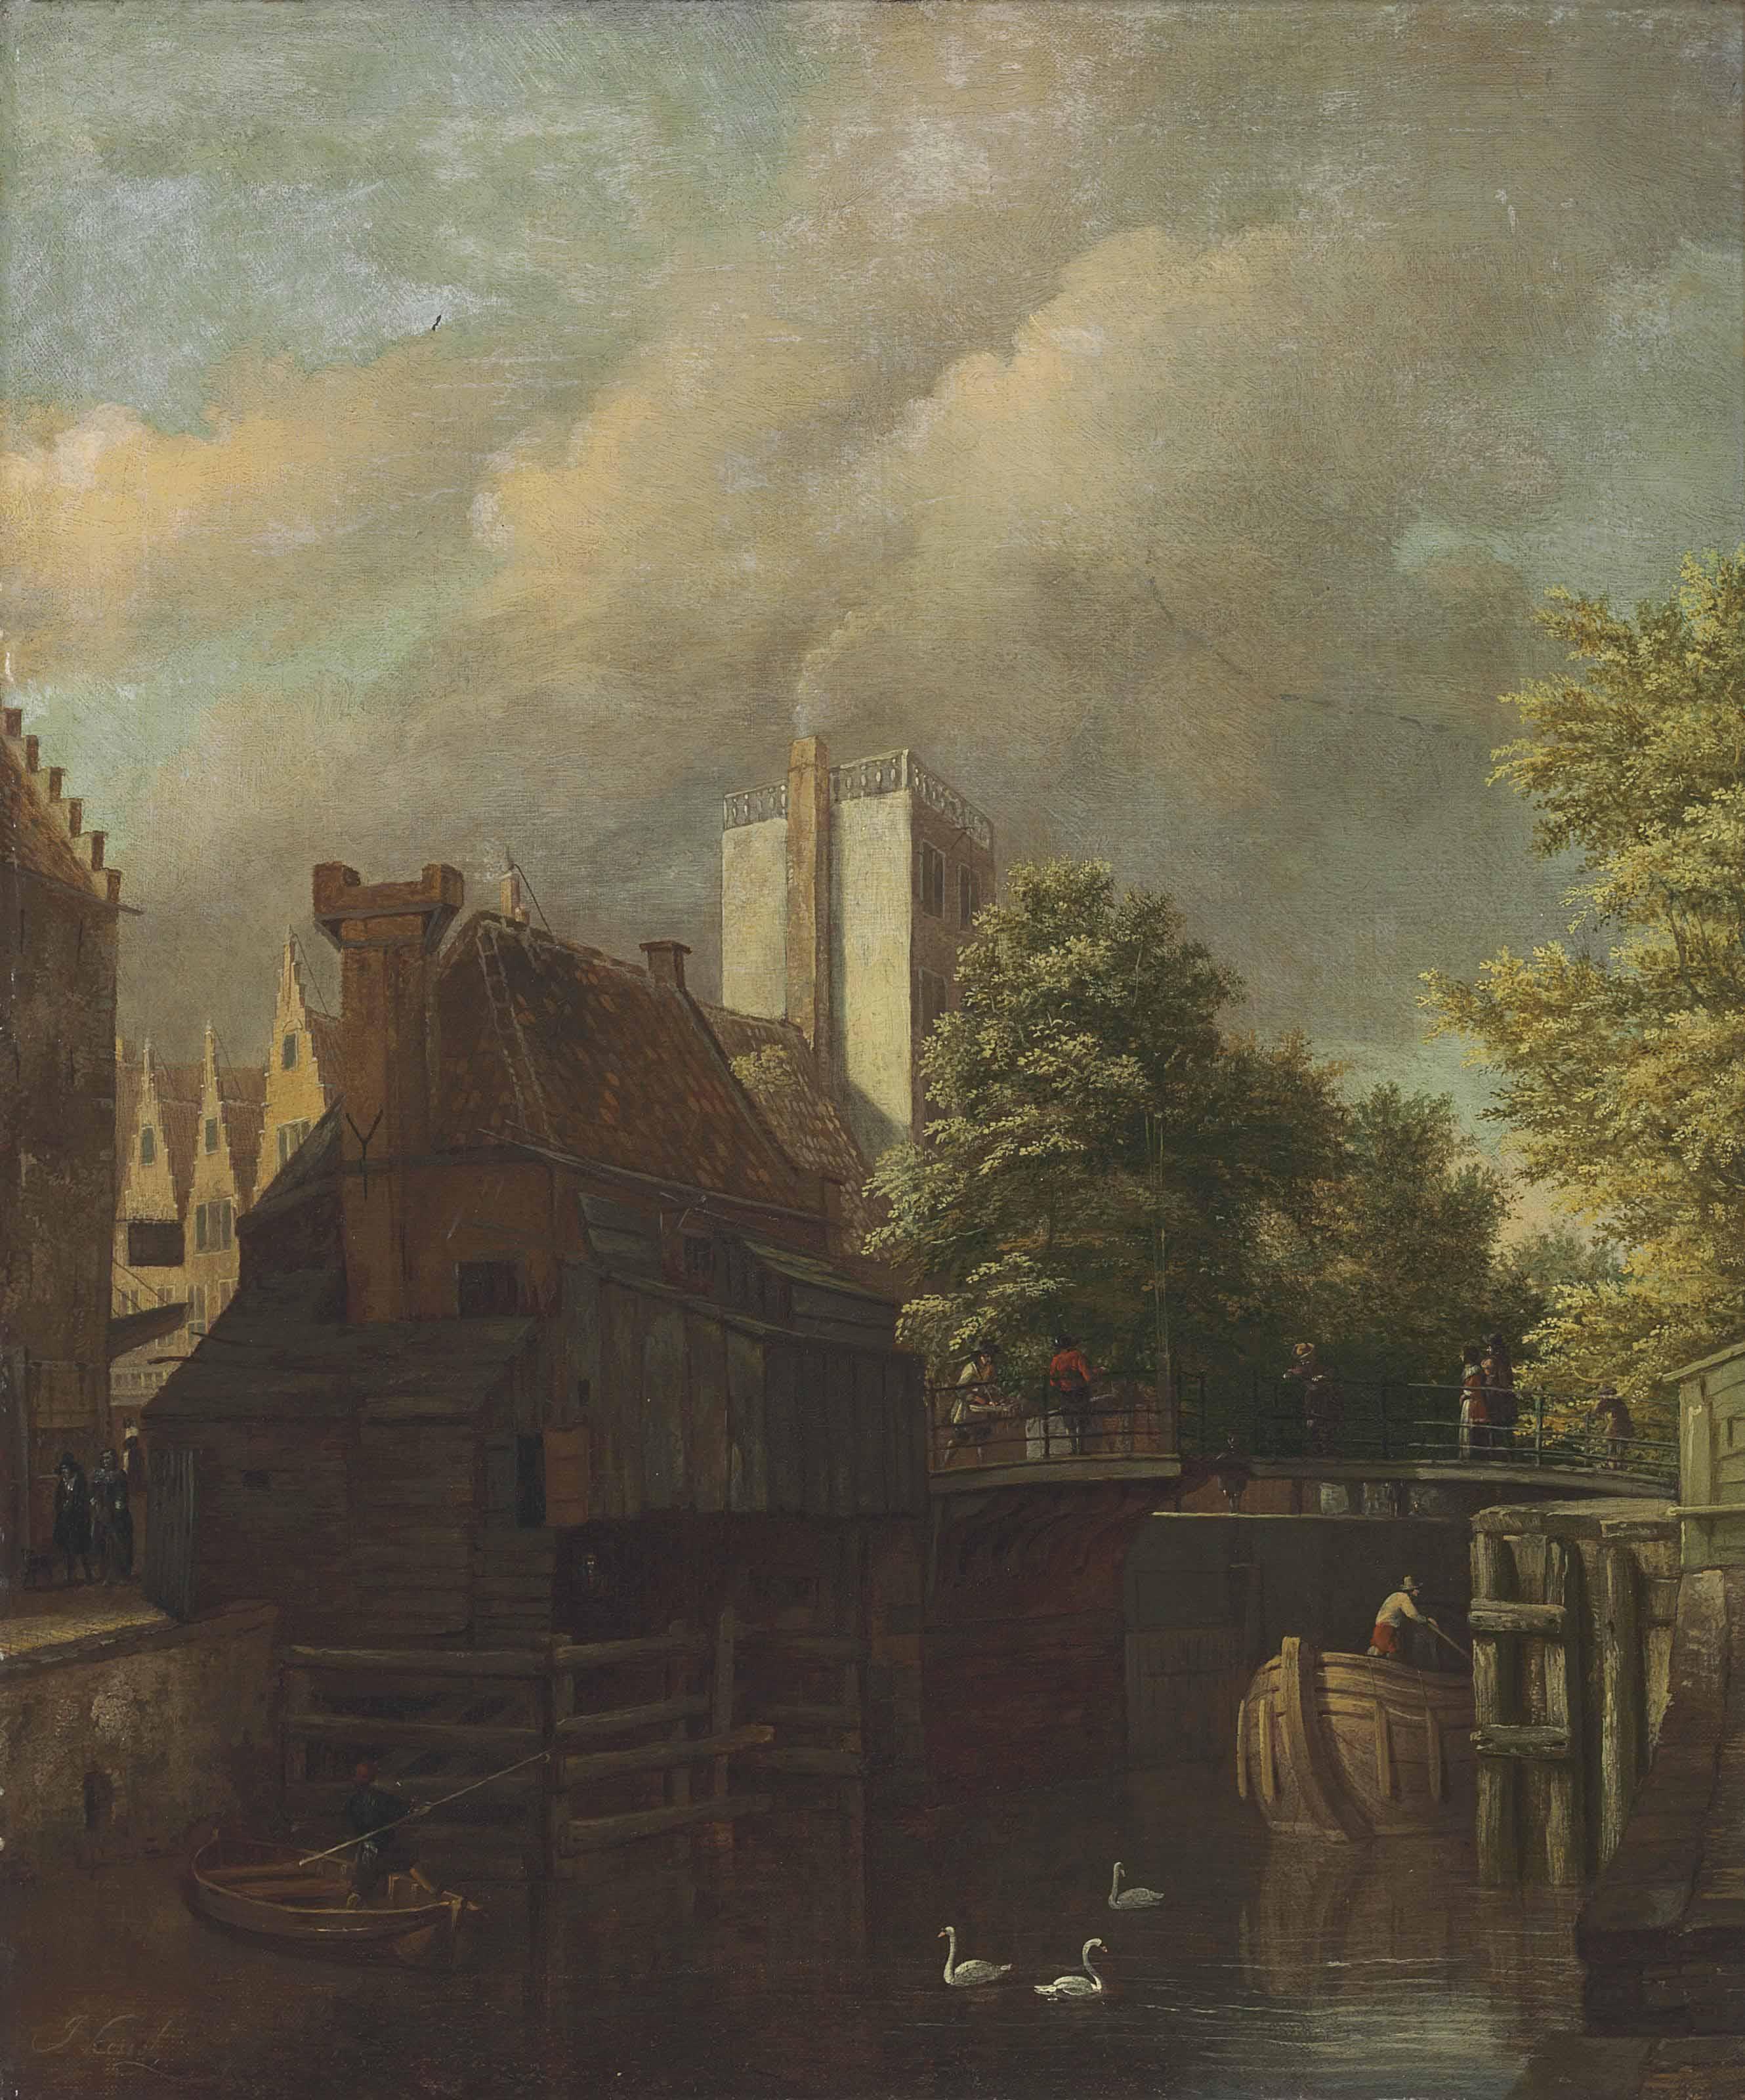 An Amsterdam canal scene